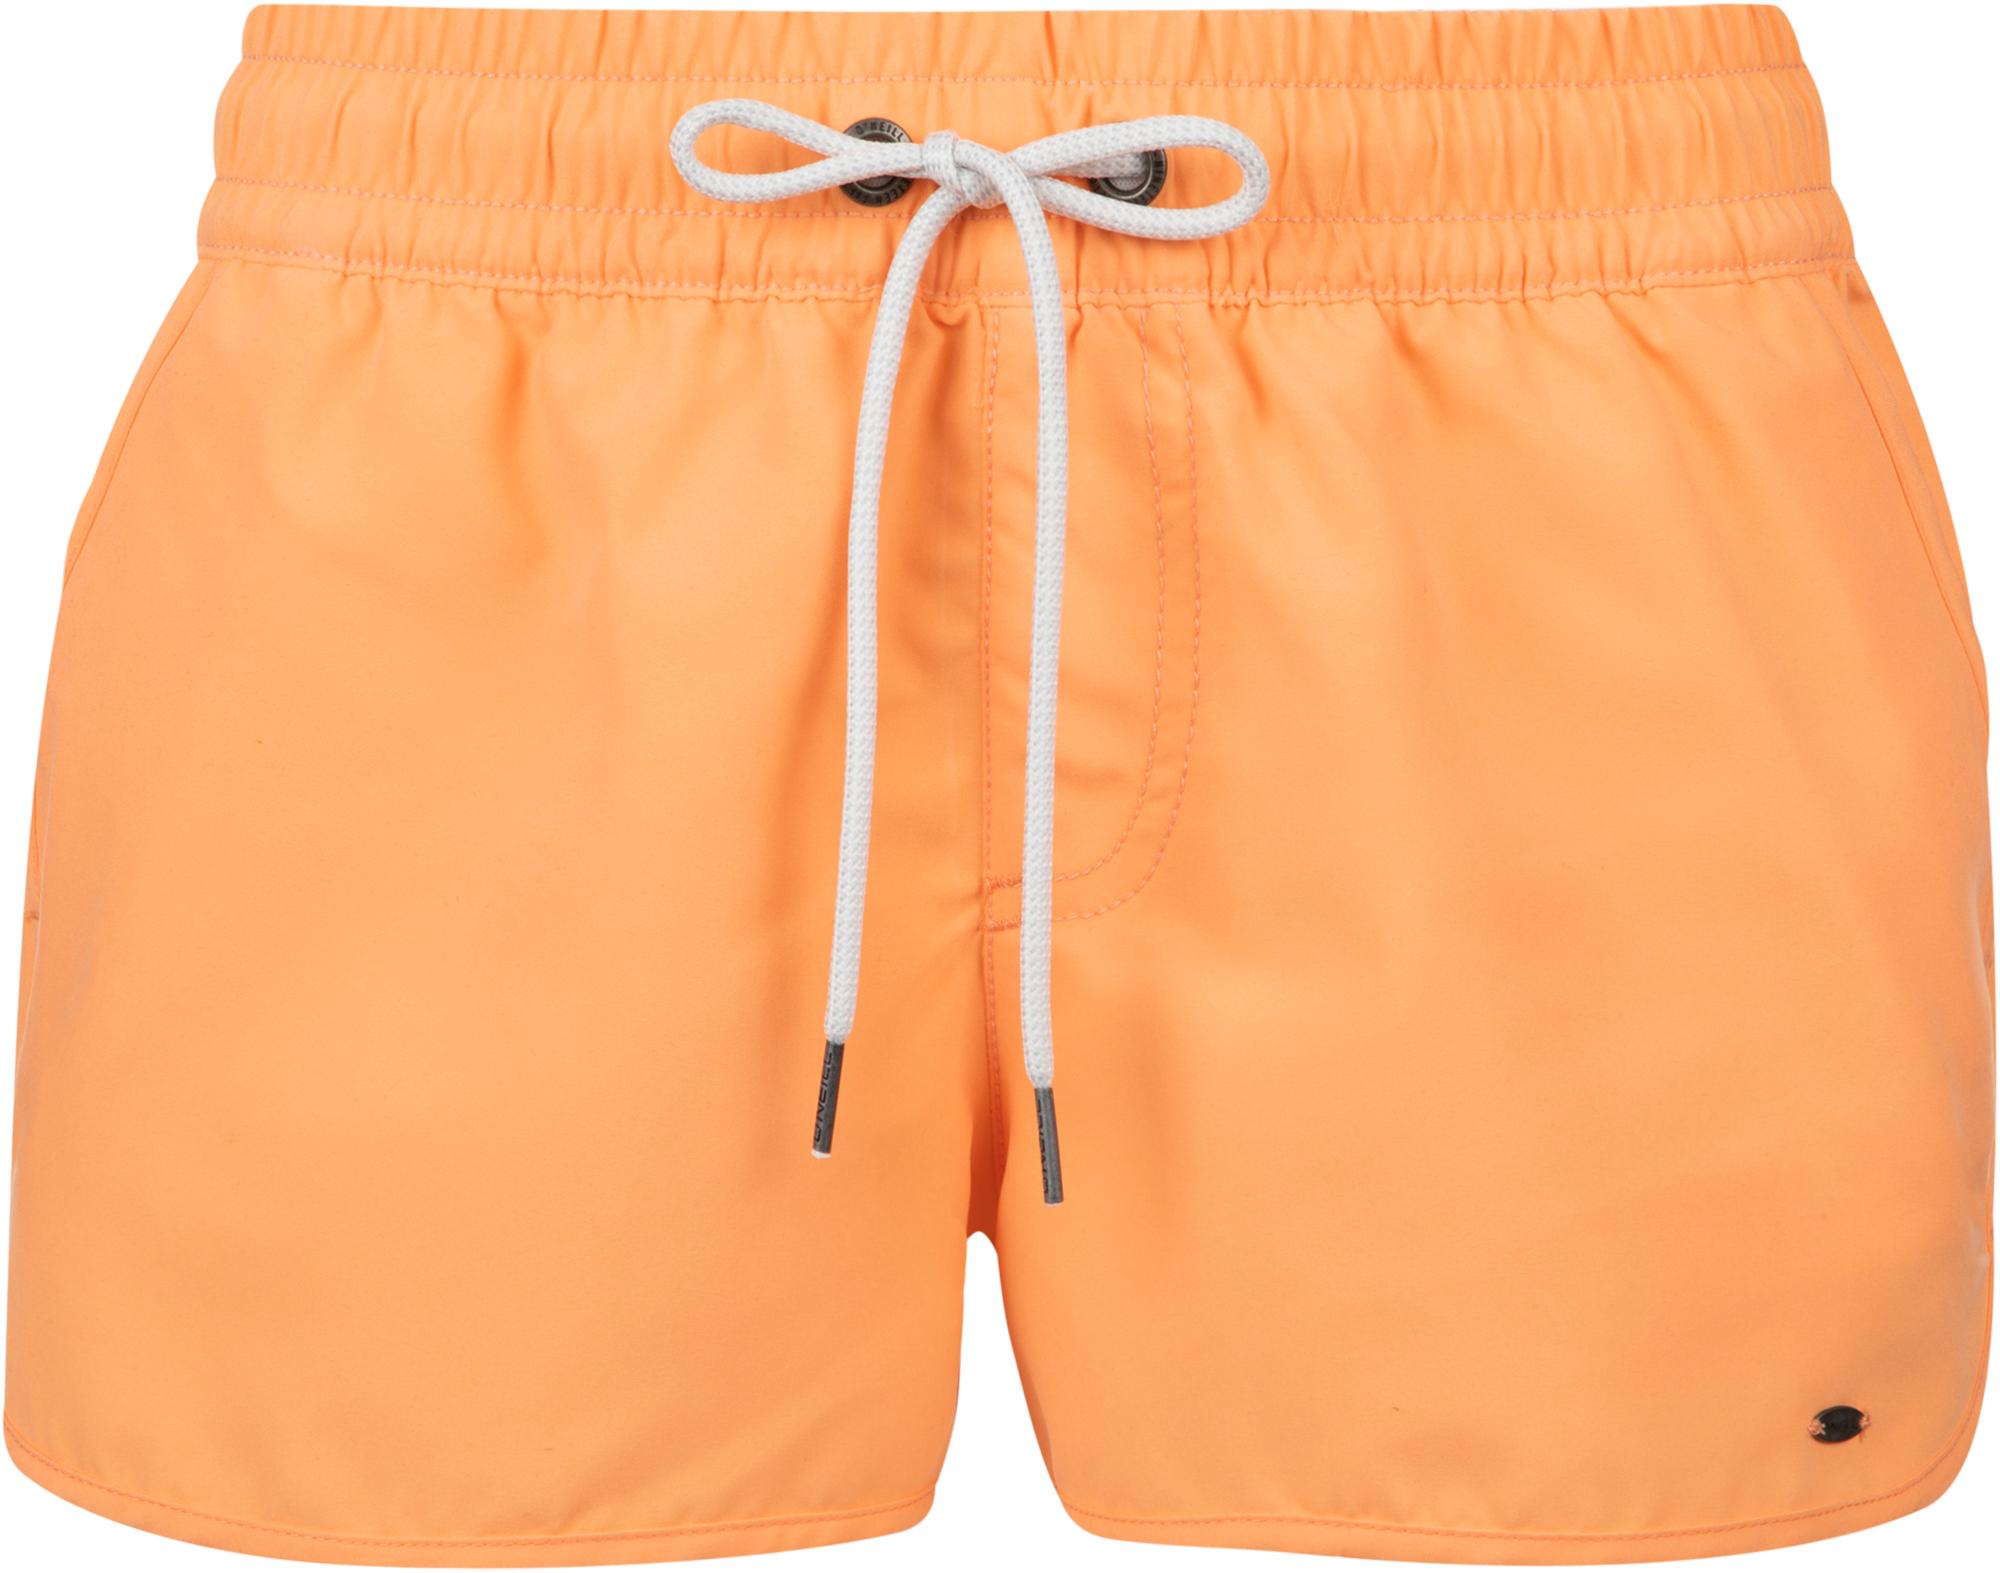 O'Neill Шорты пляжные женские O'Neill Solid, размер 42-44 цена 2017